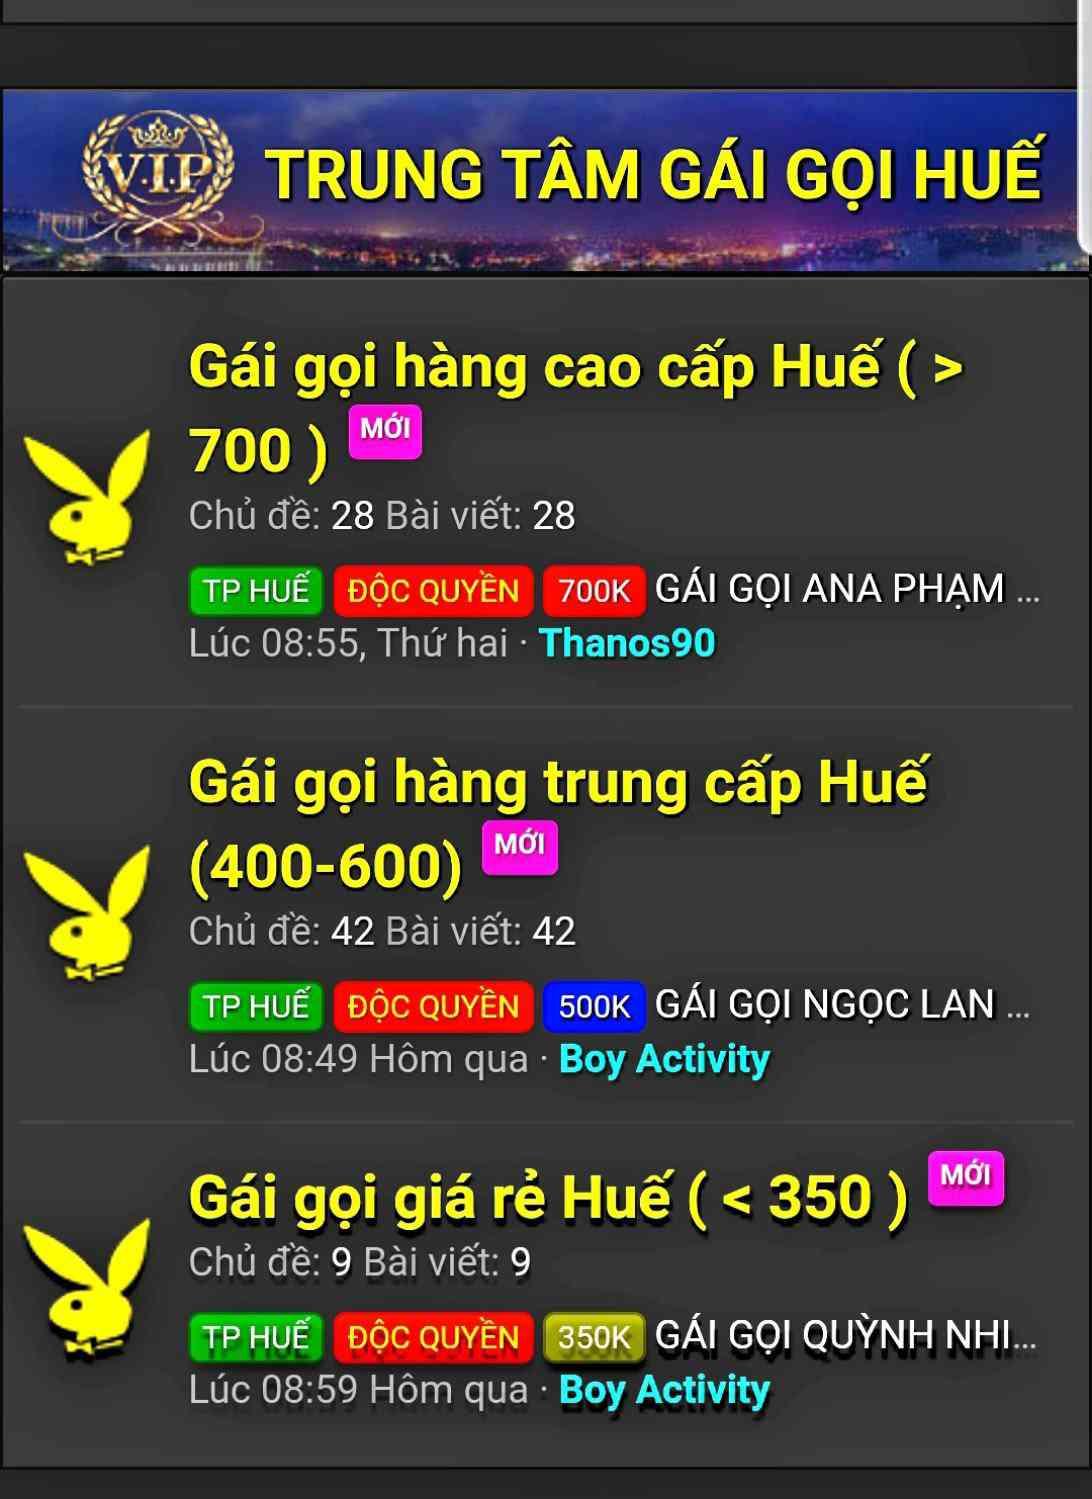 tham nhap thi truong gai goi o hue thoi dai 4.0: doc password, xem menu, order hang - 3